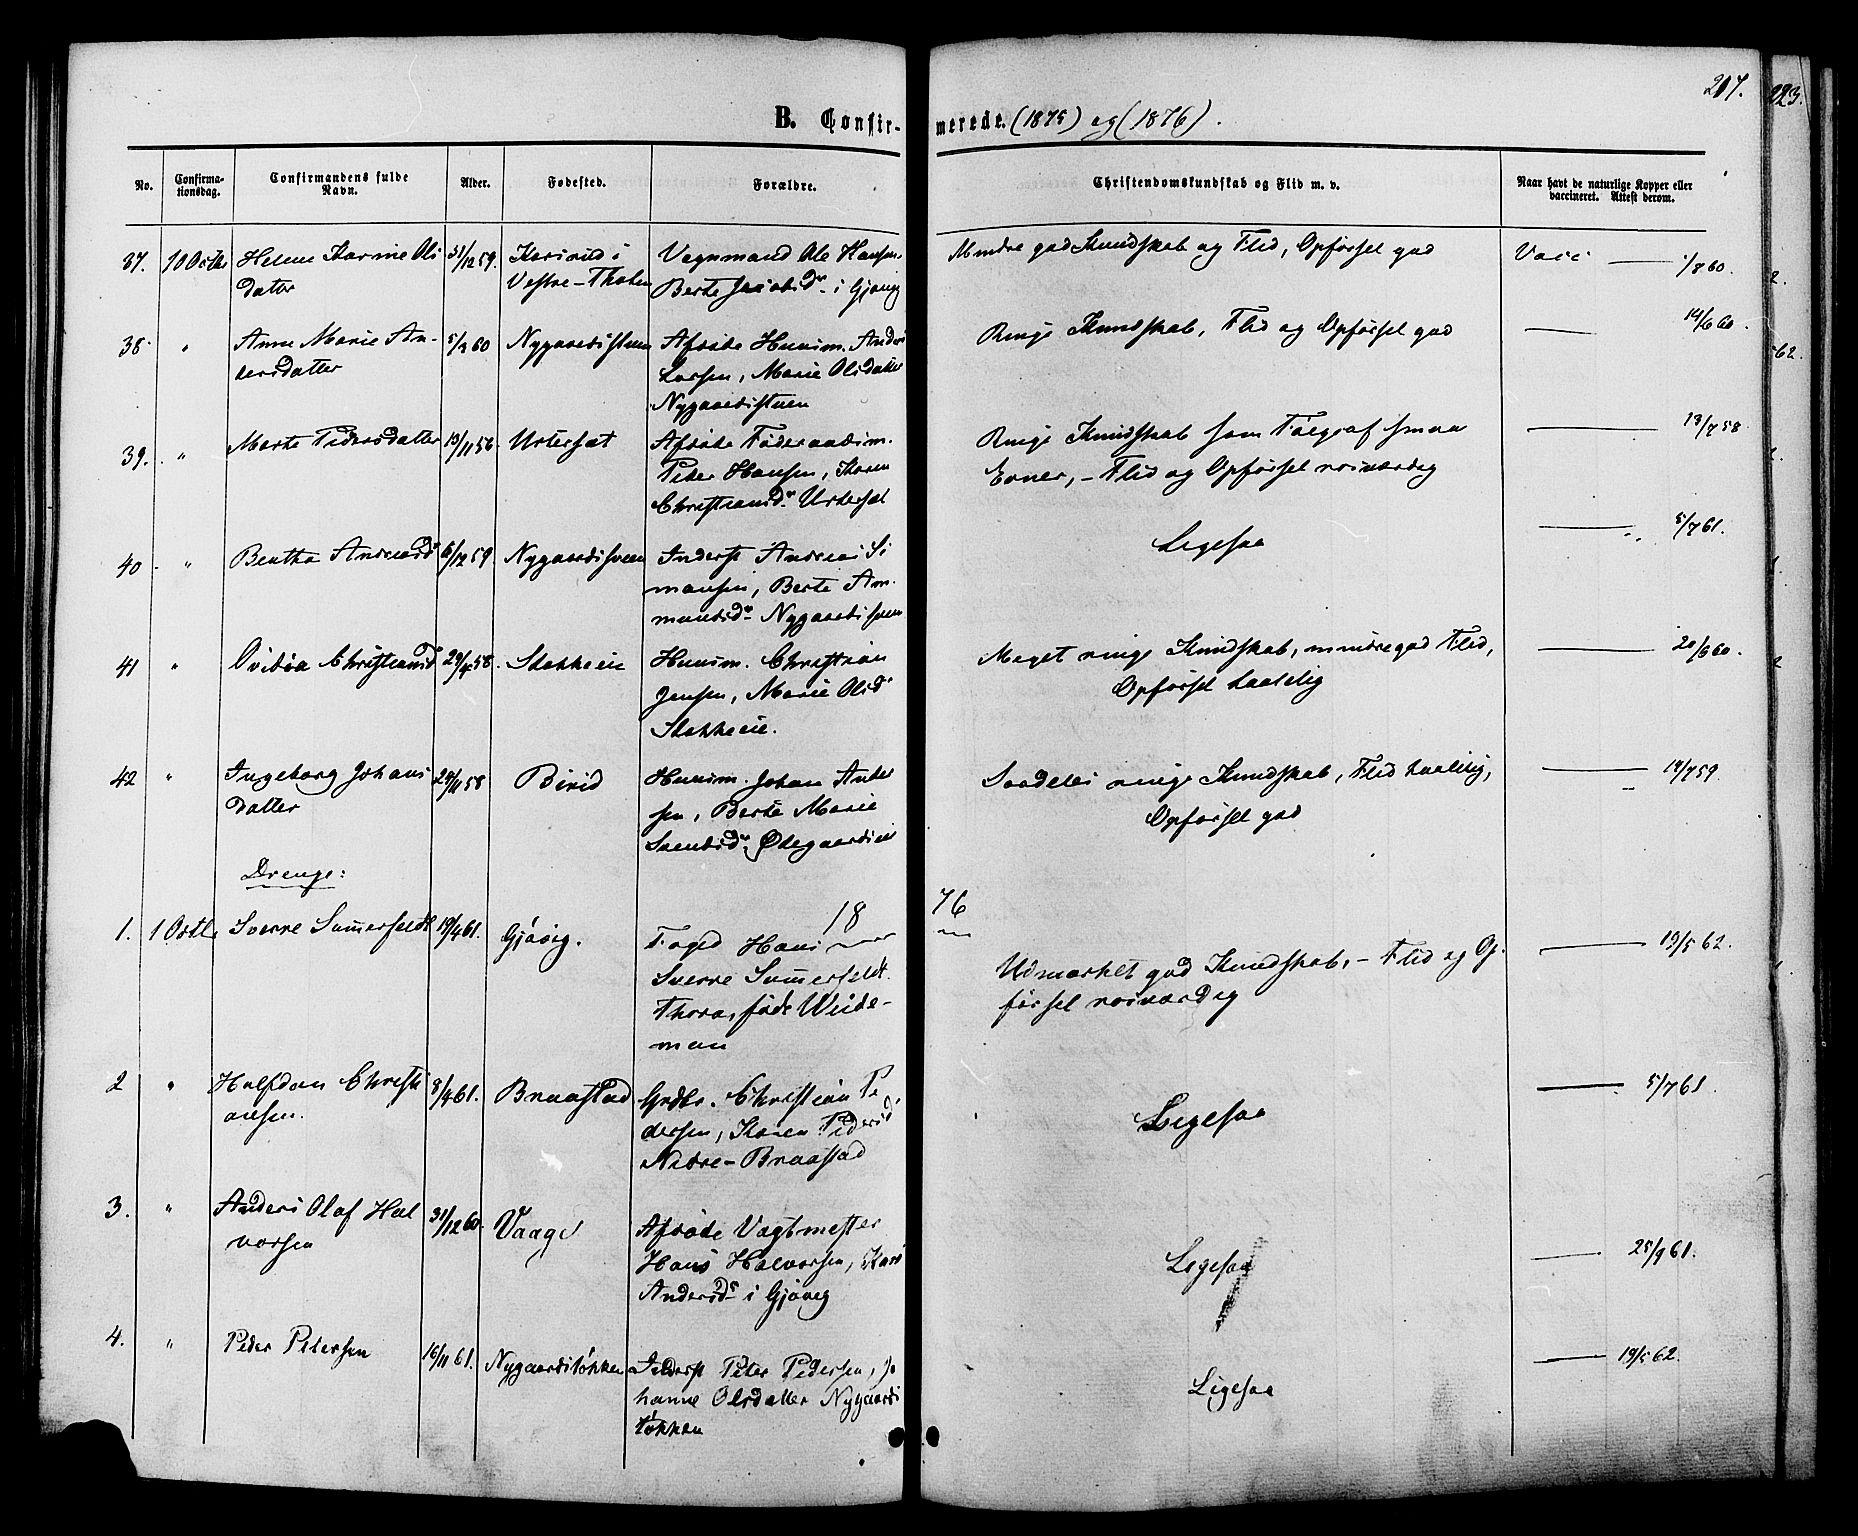 SAH, Vardal prestekontor, H/Ha/Haa/L0007: Ministerialbok nr. 7, 1867-1878, s. 217